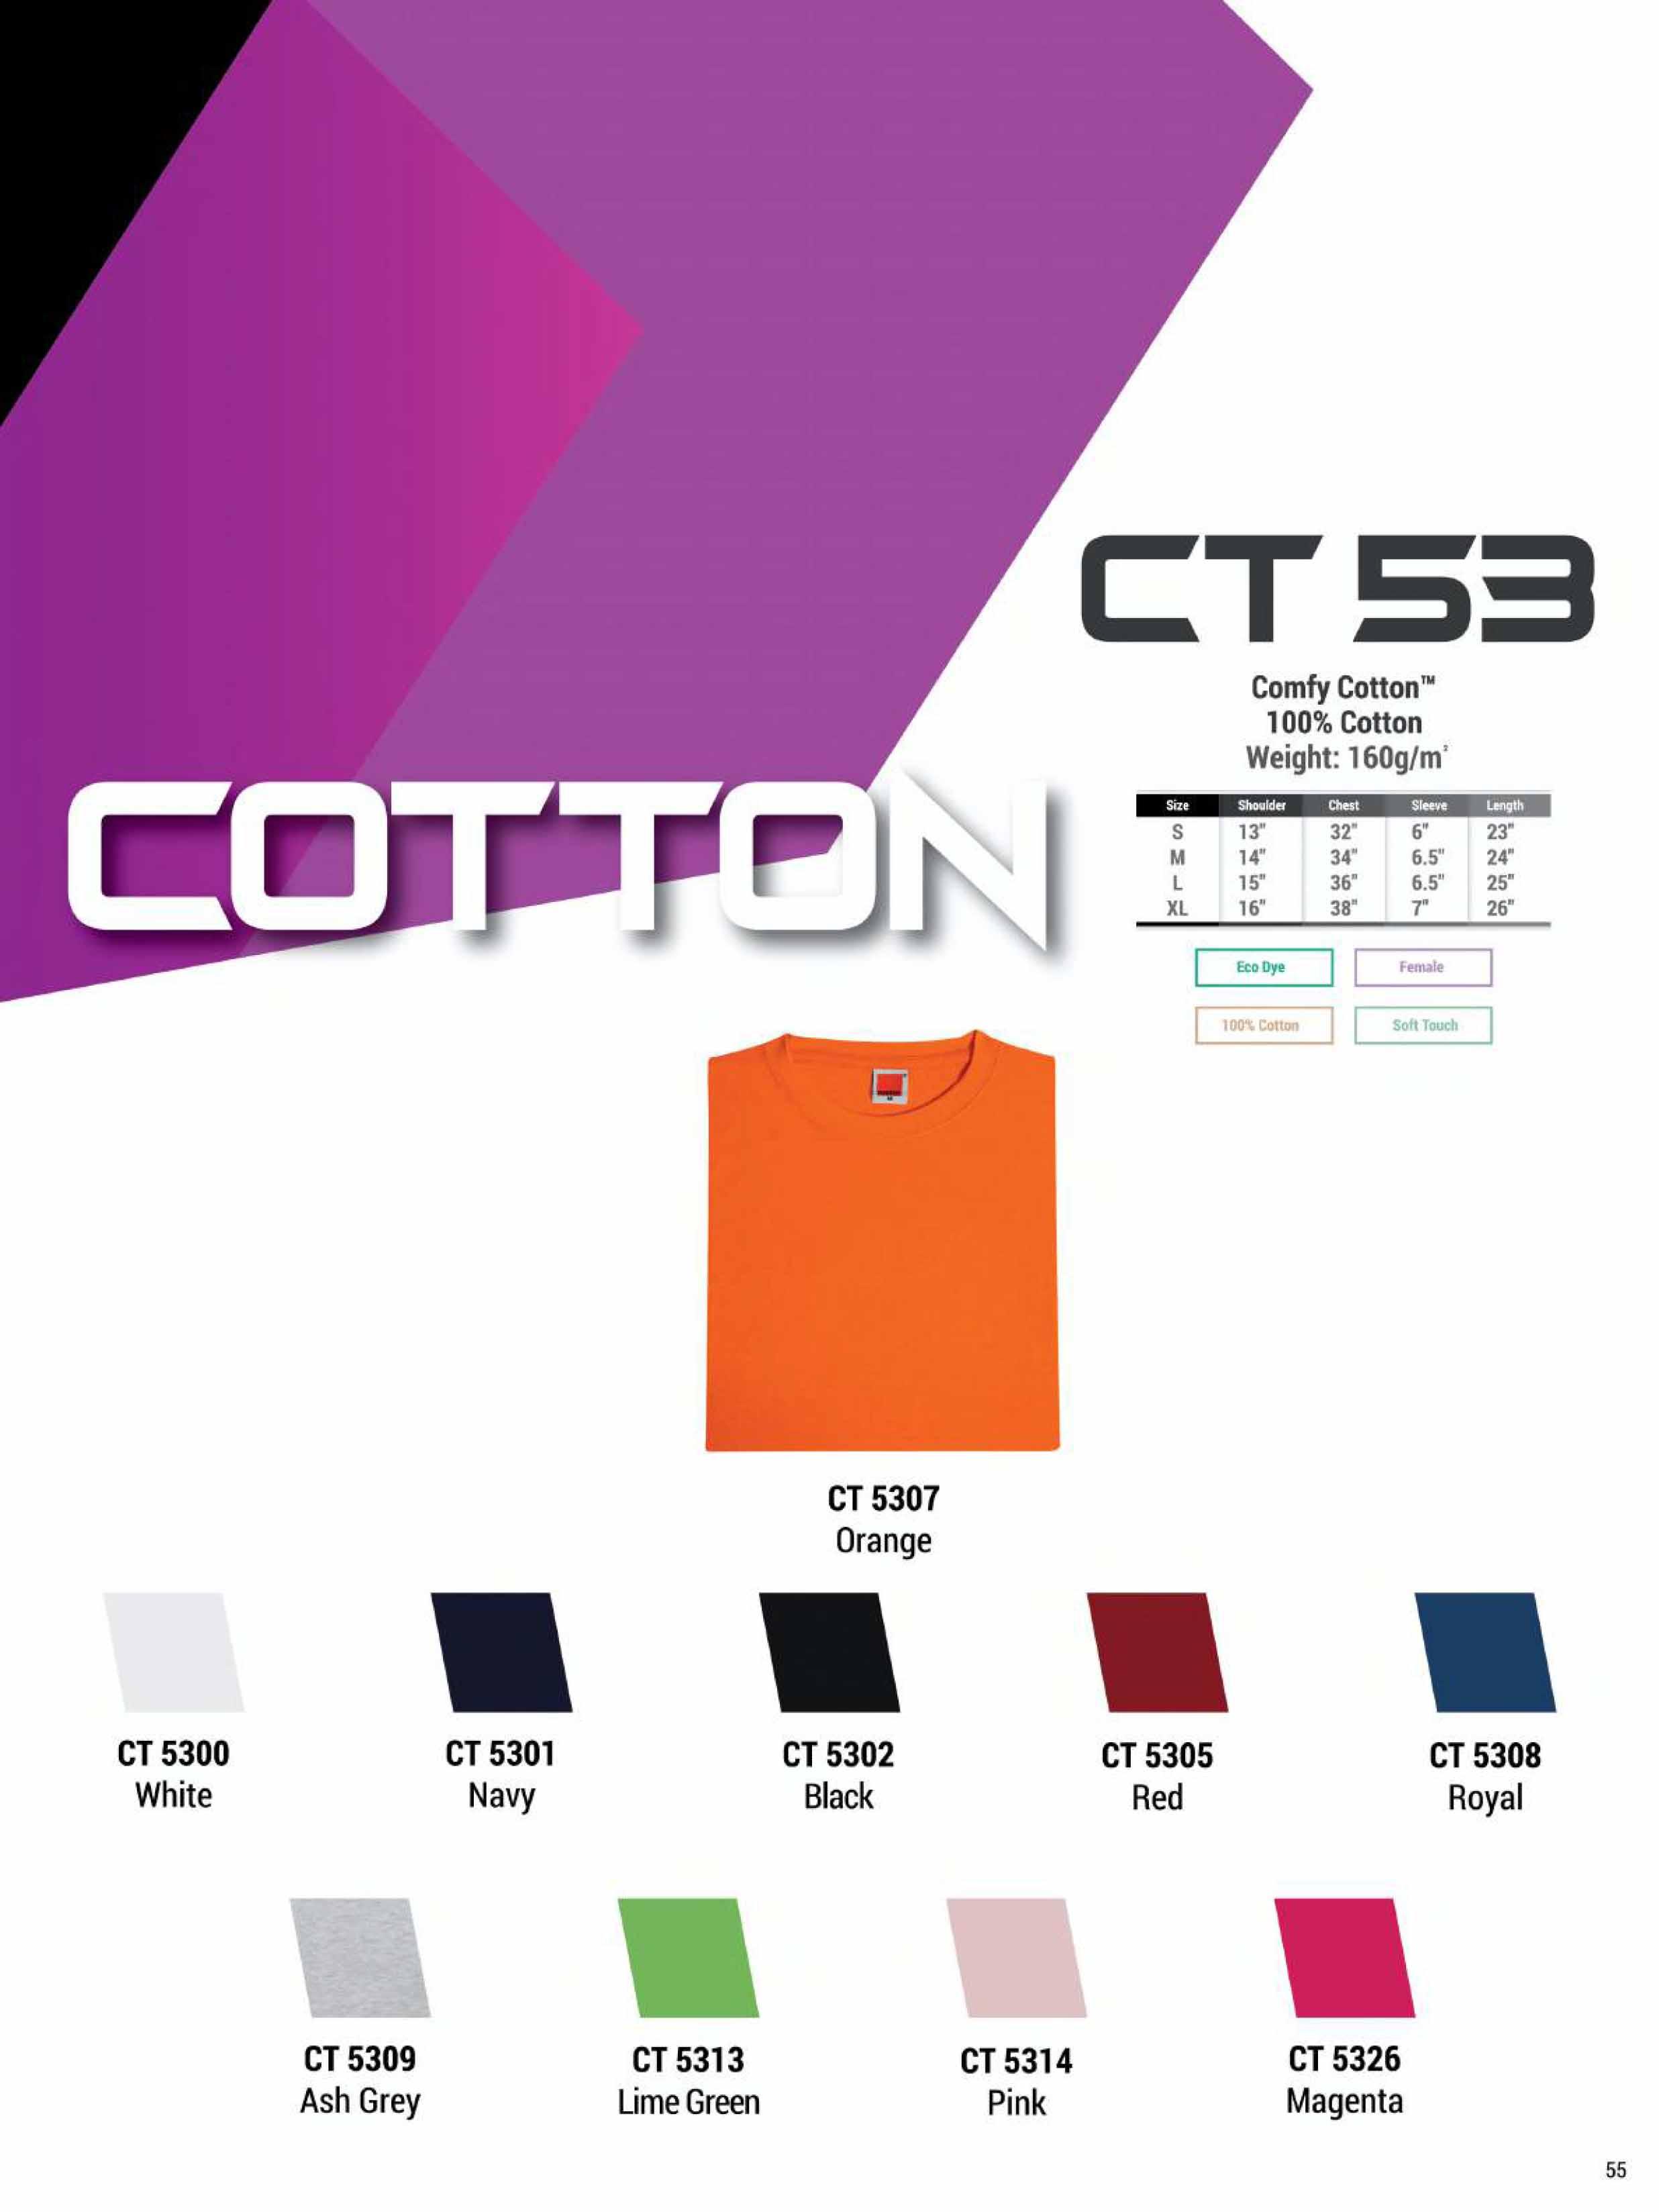 CT53 COTTON T-SHIRT